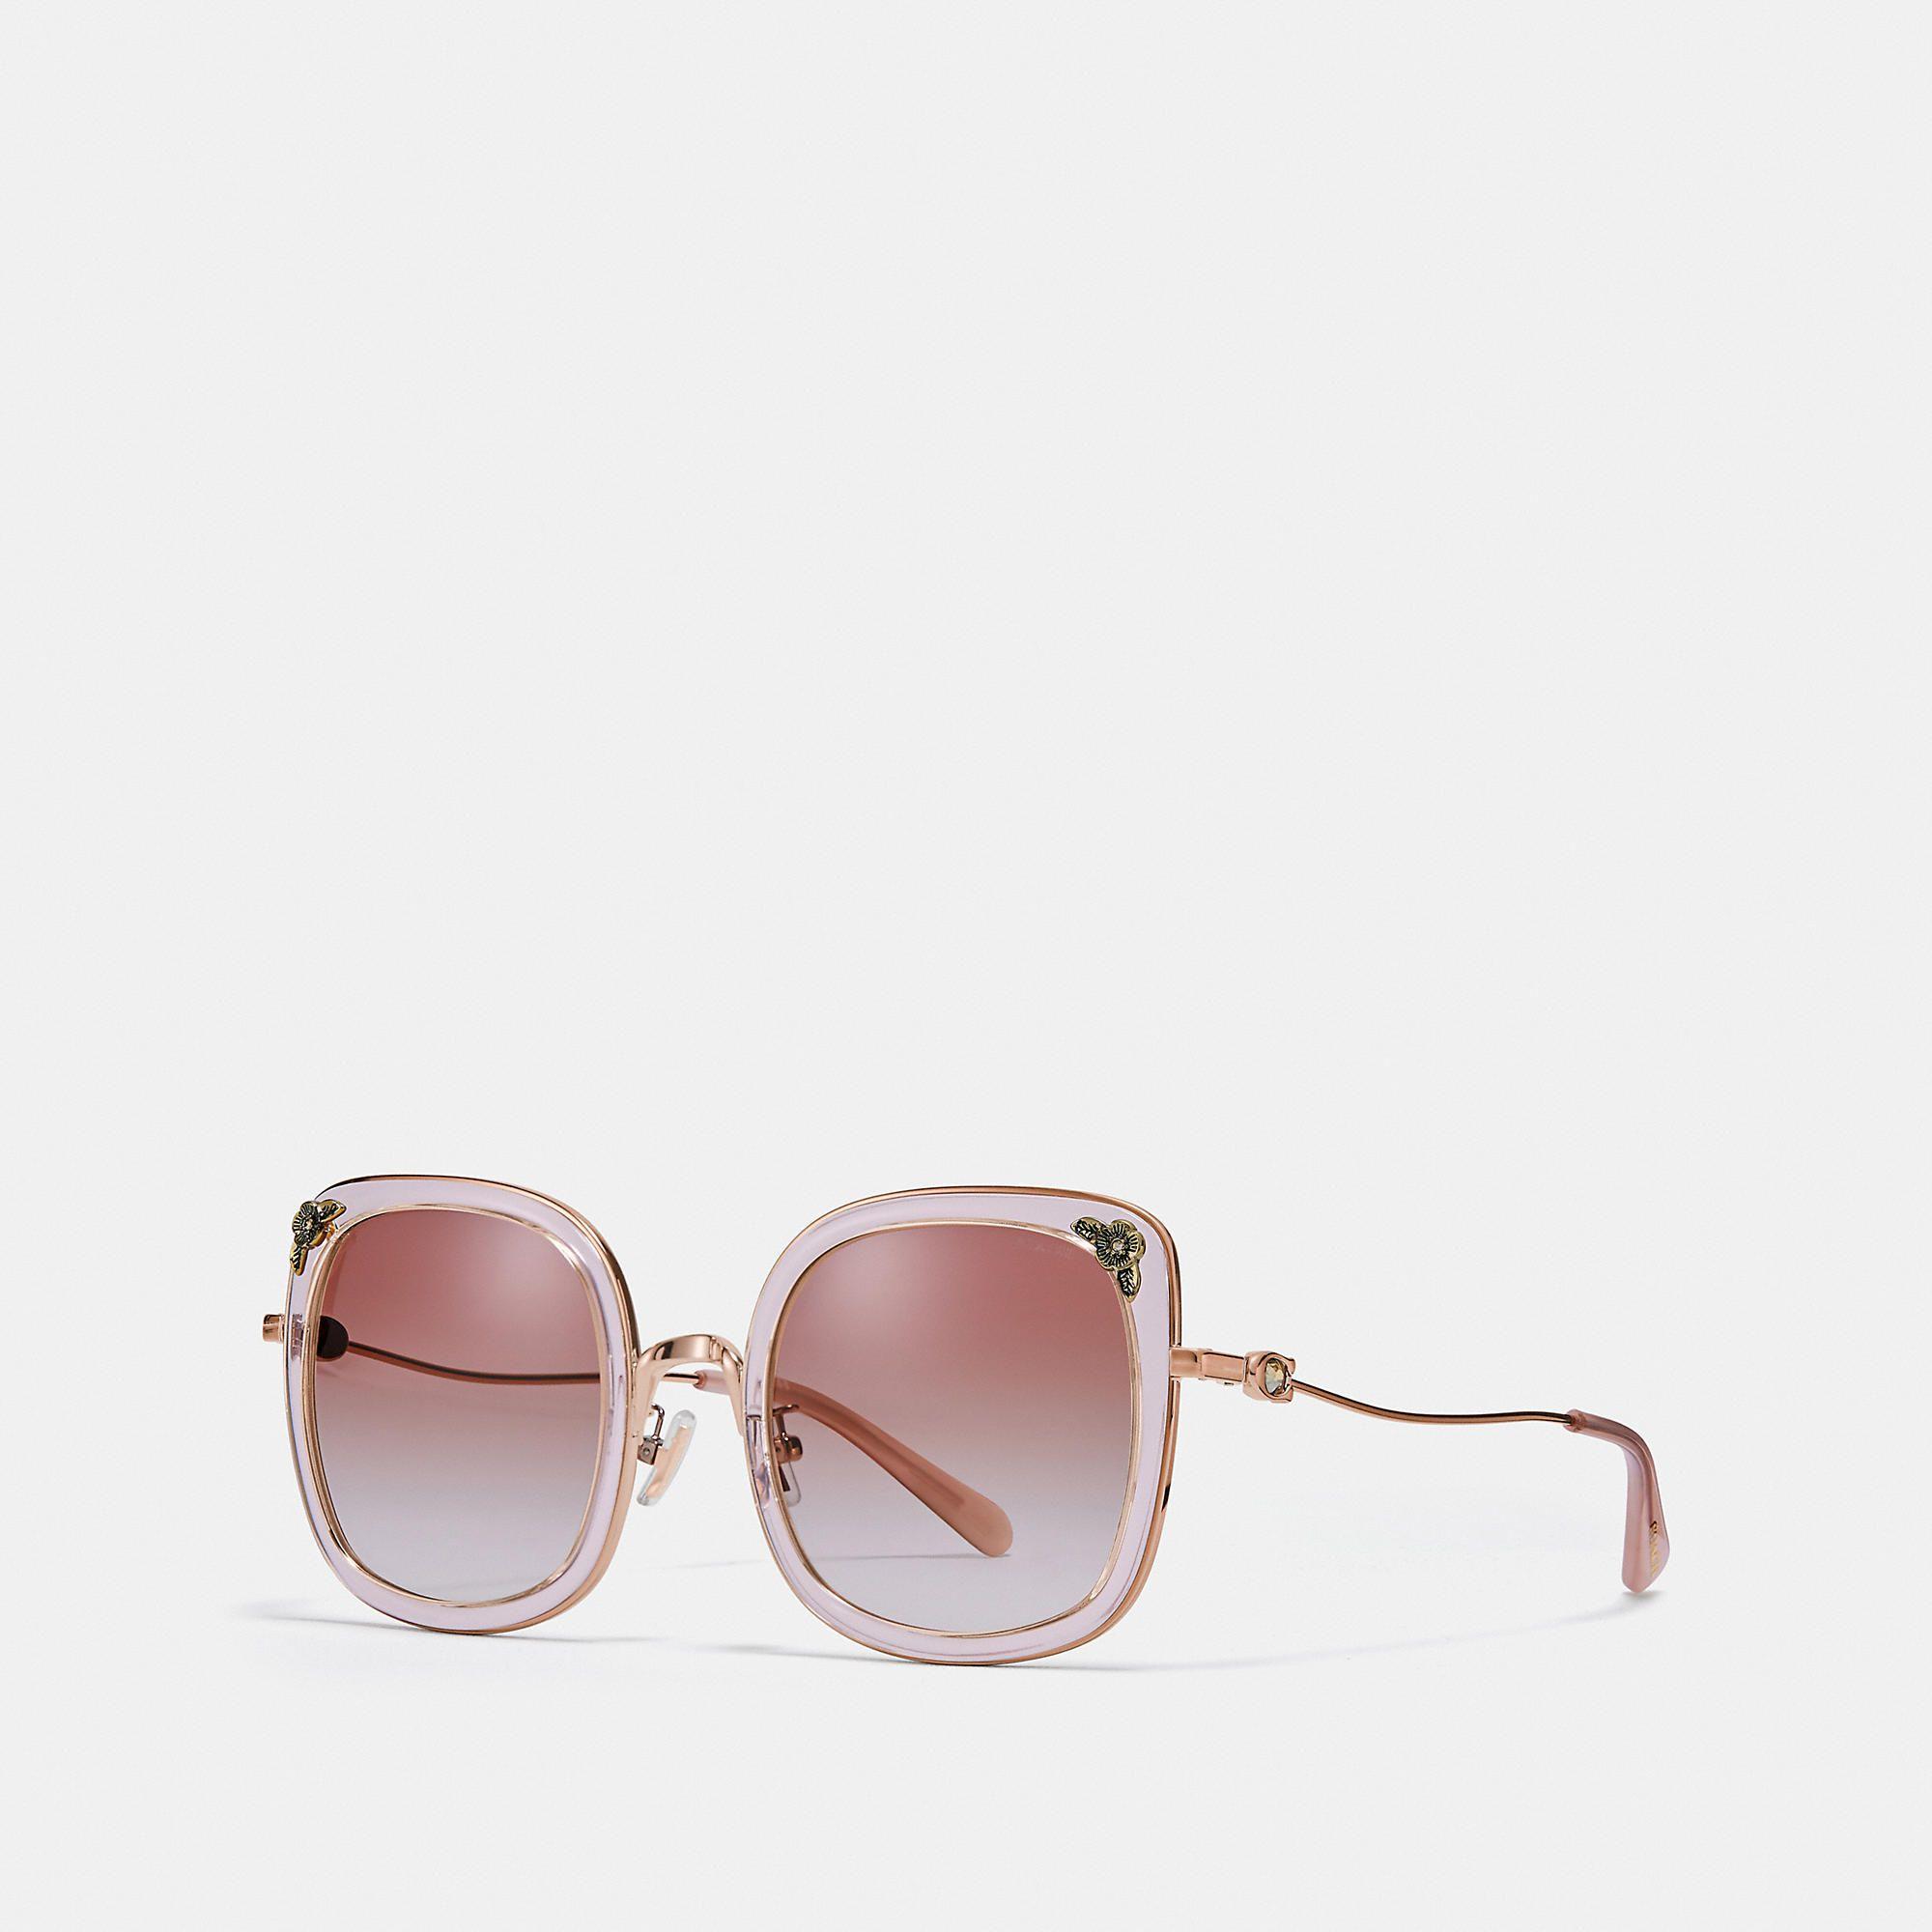 a986e723bd COACH Tea Rose Square Sunglasses - Women s Sunwear